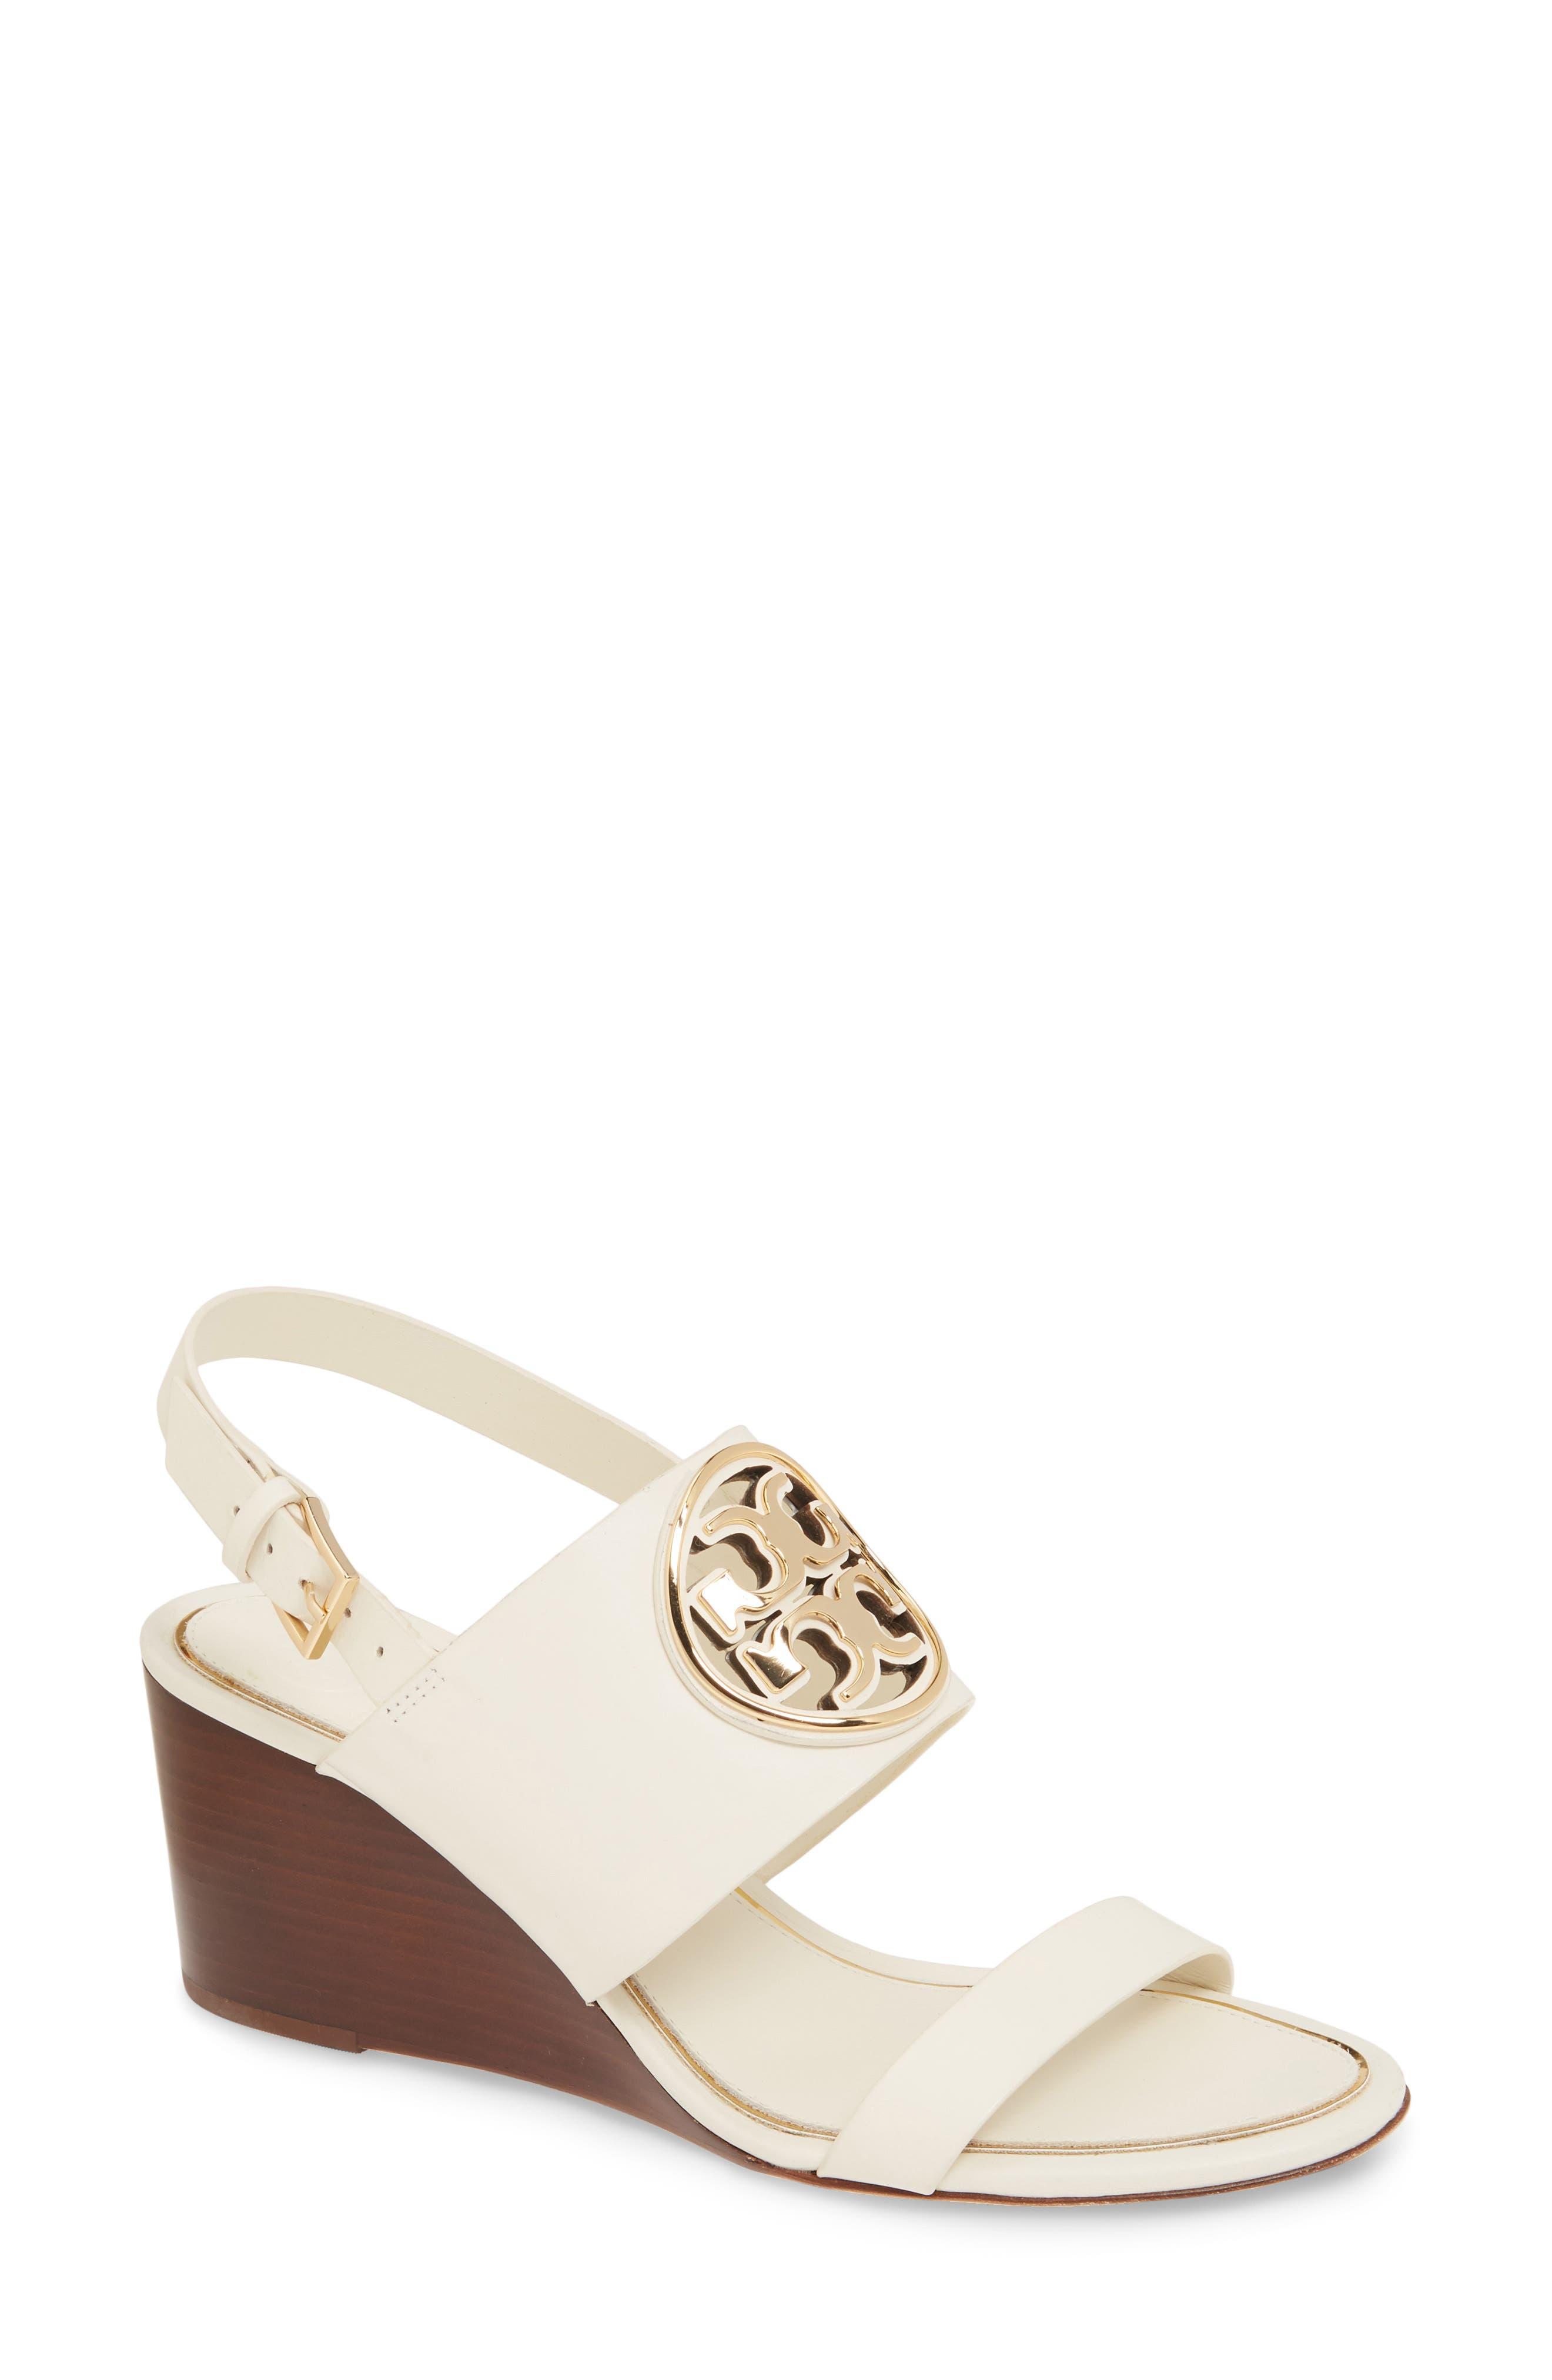 5bef93830595 Women s Tory Burch Wedge Sandals